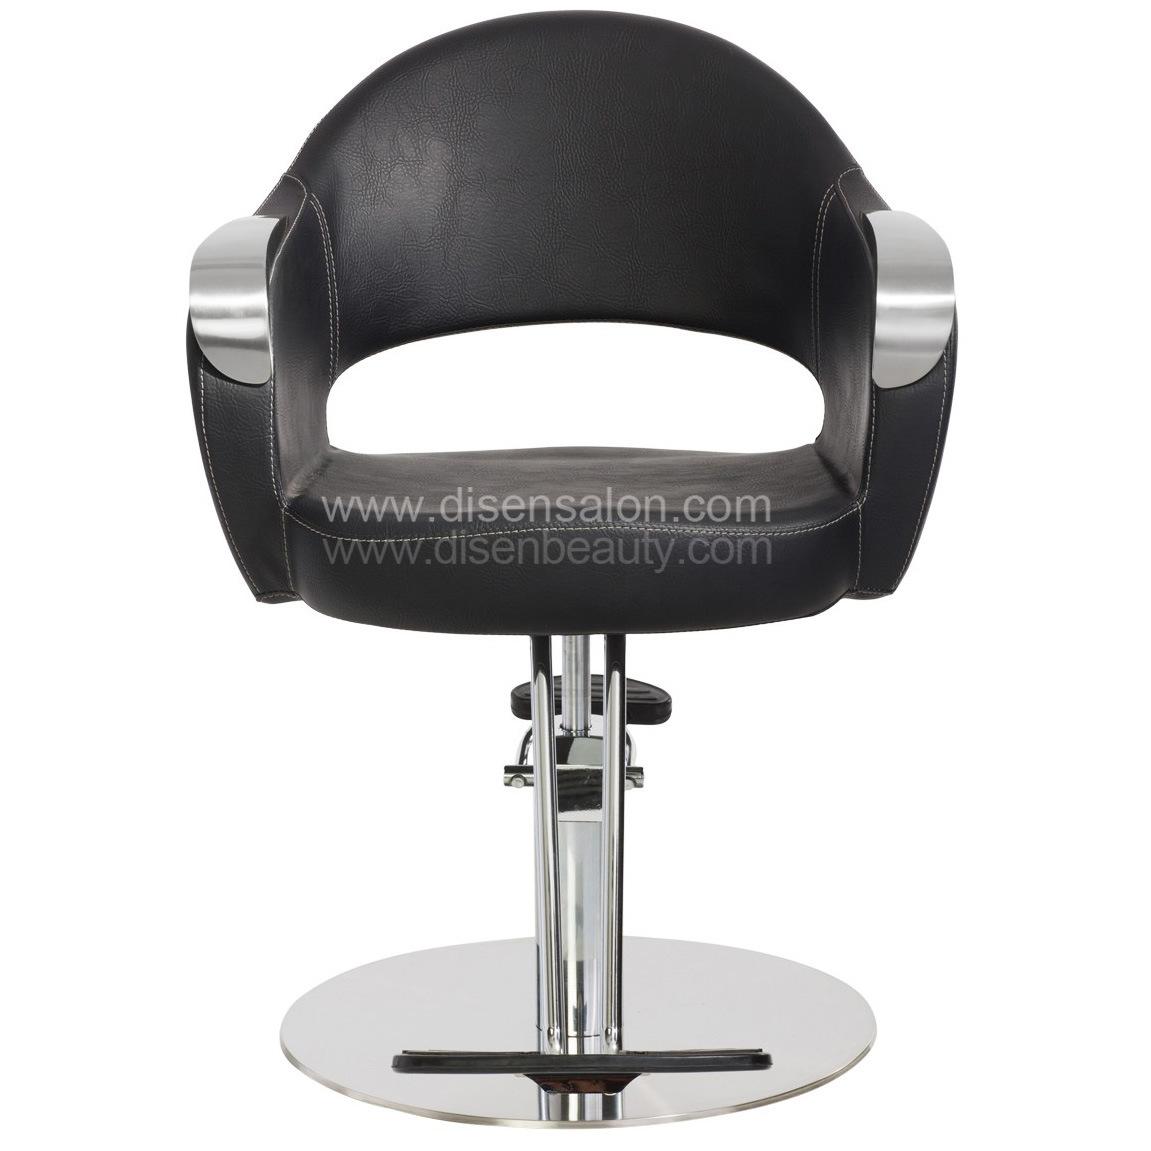 Comfortable High Quality Beauty Salon Furniture Salon Chair (AL356)